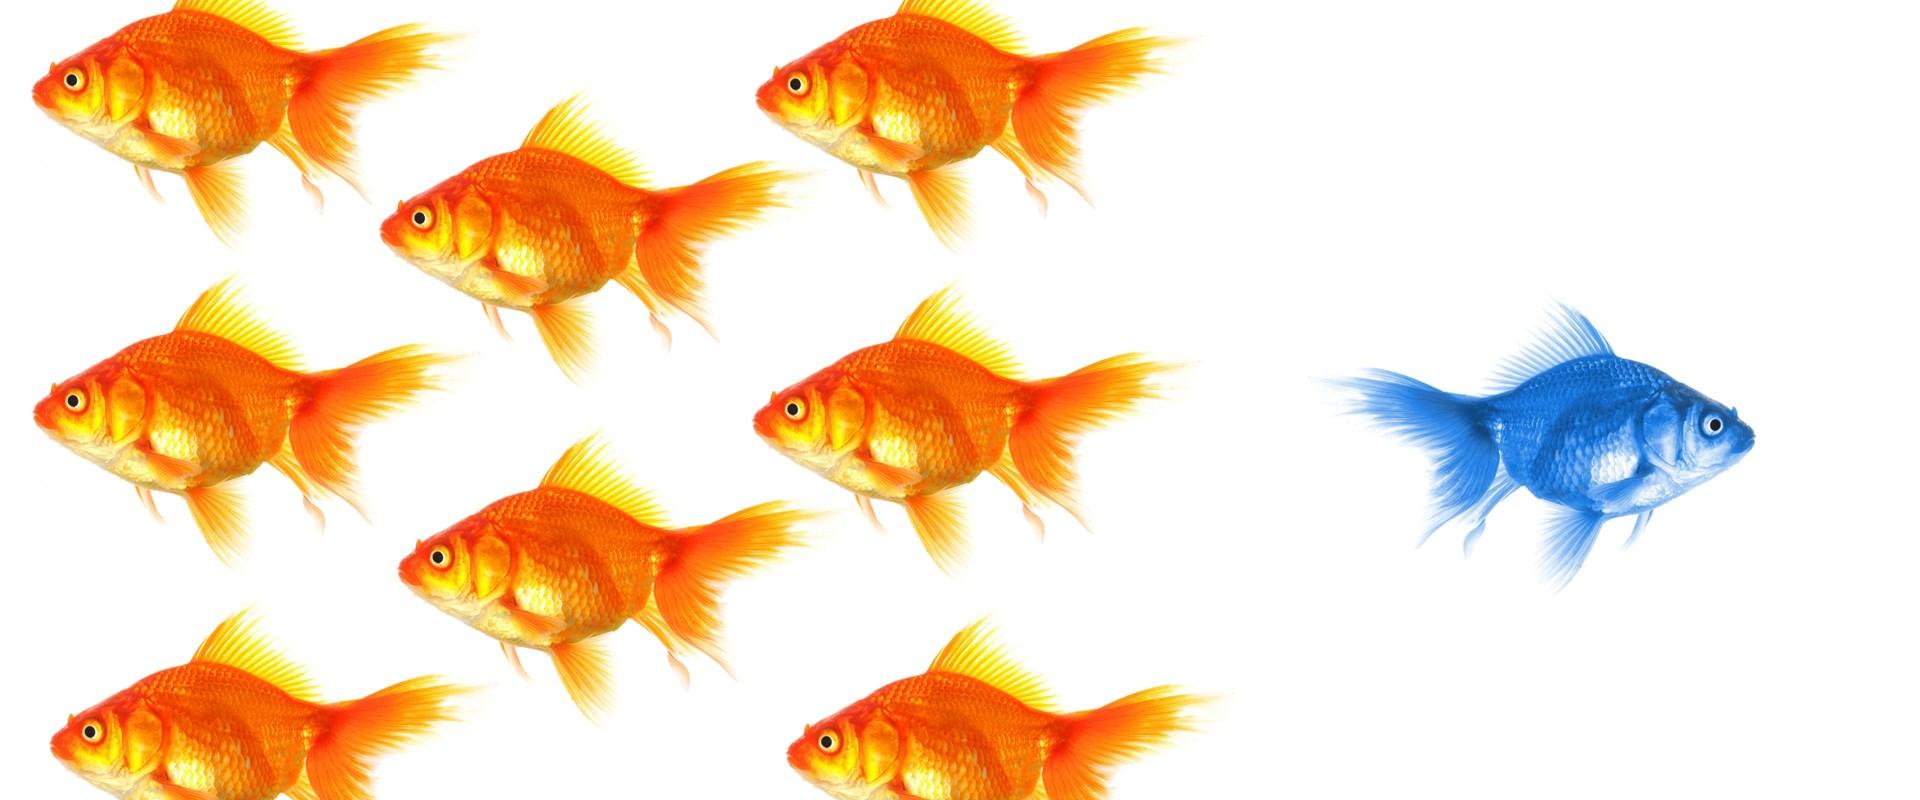 Independence Direction Leadership Fish Metaphor